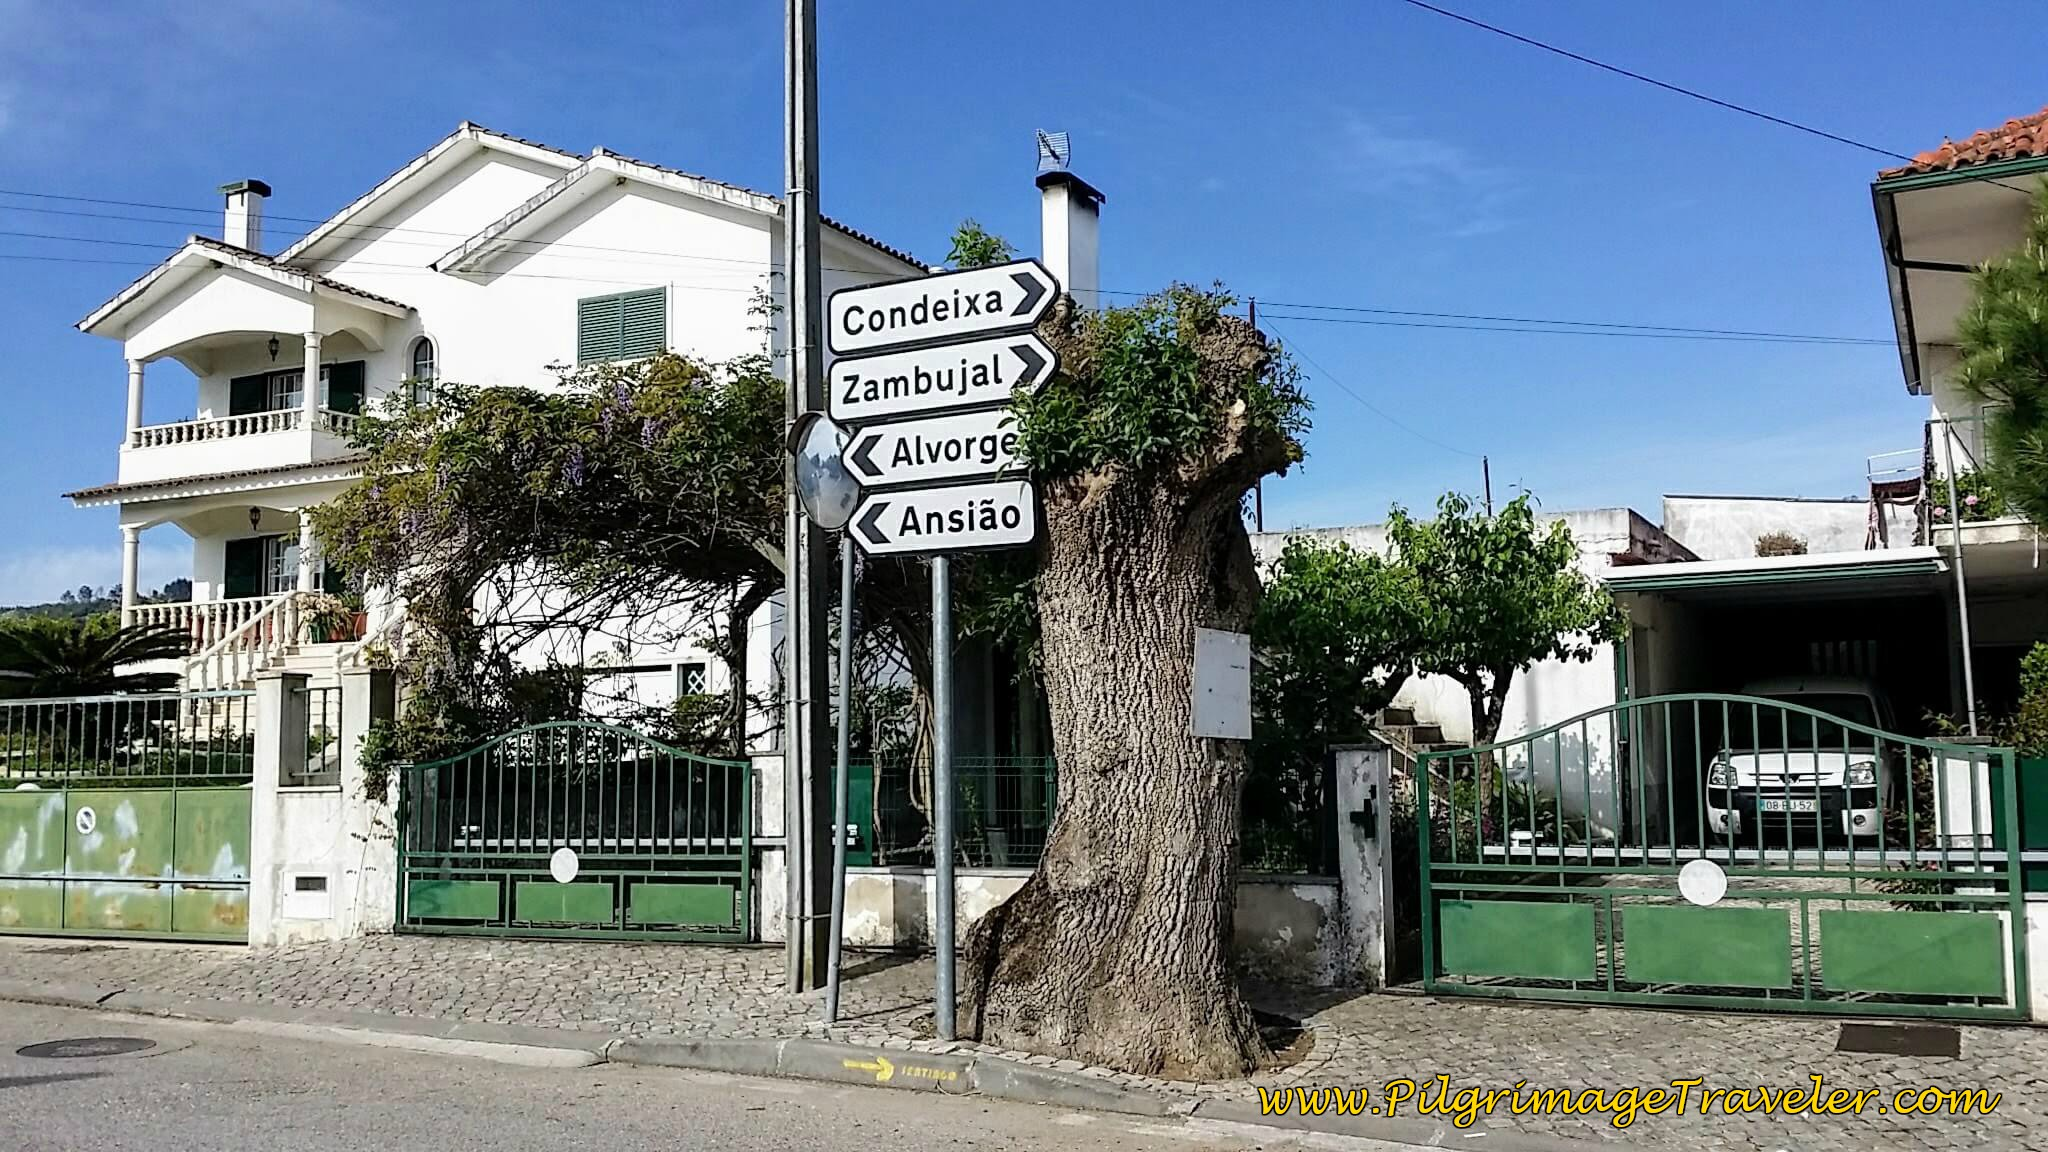 Right Turn back on N347-1 Toward Condeixa